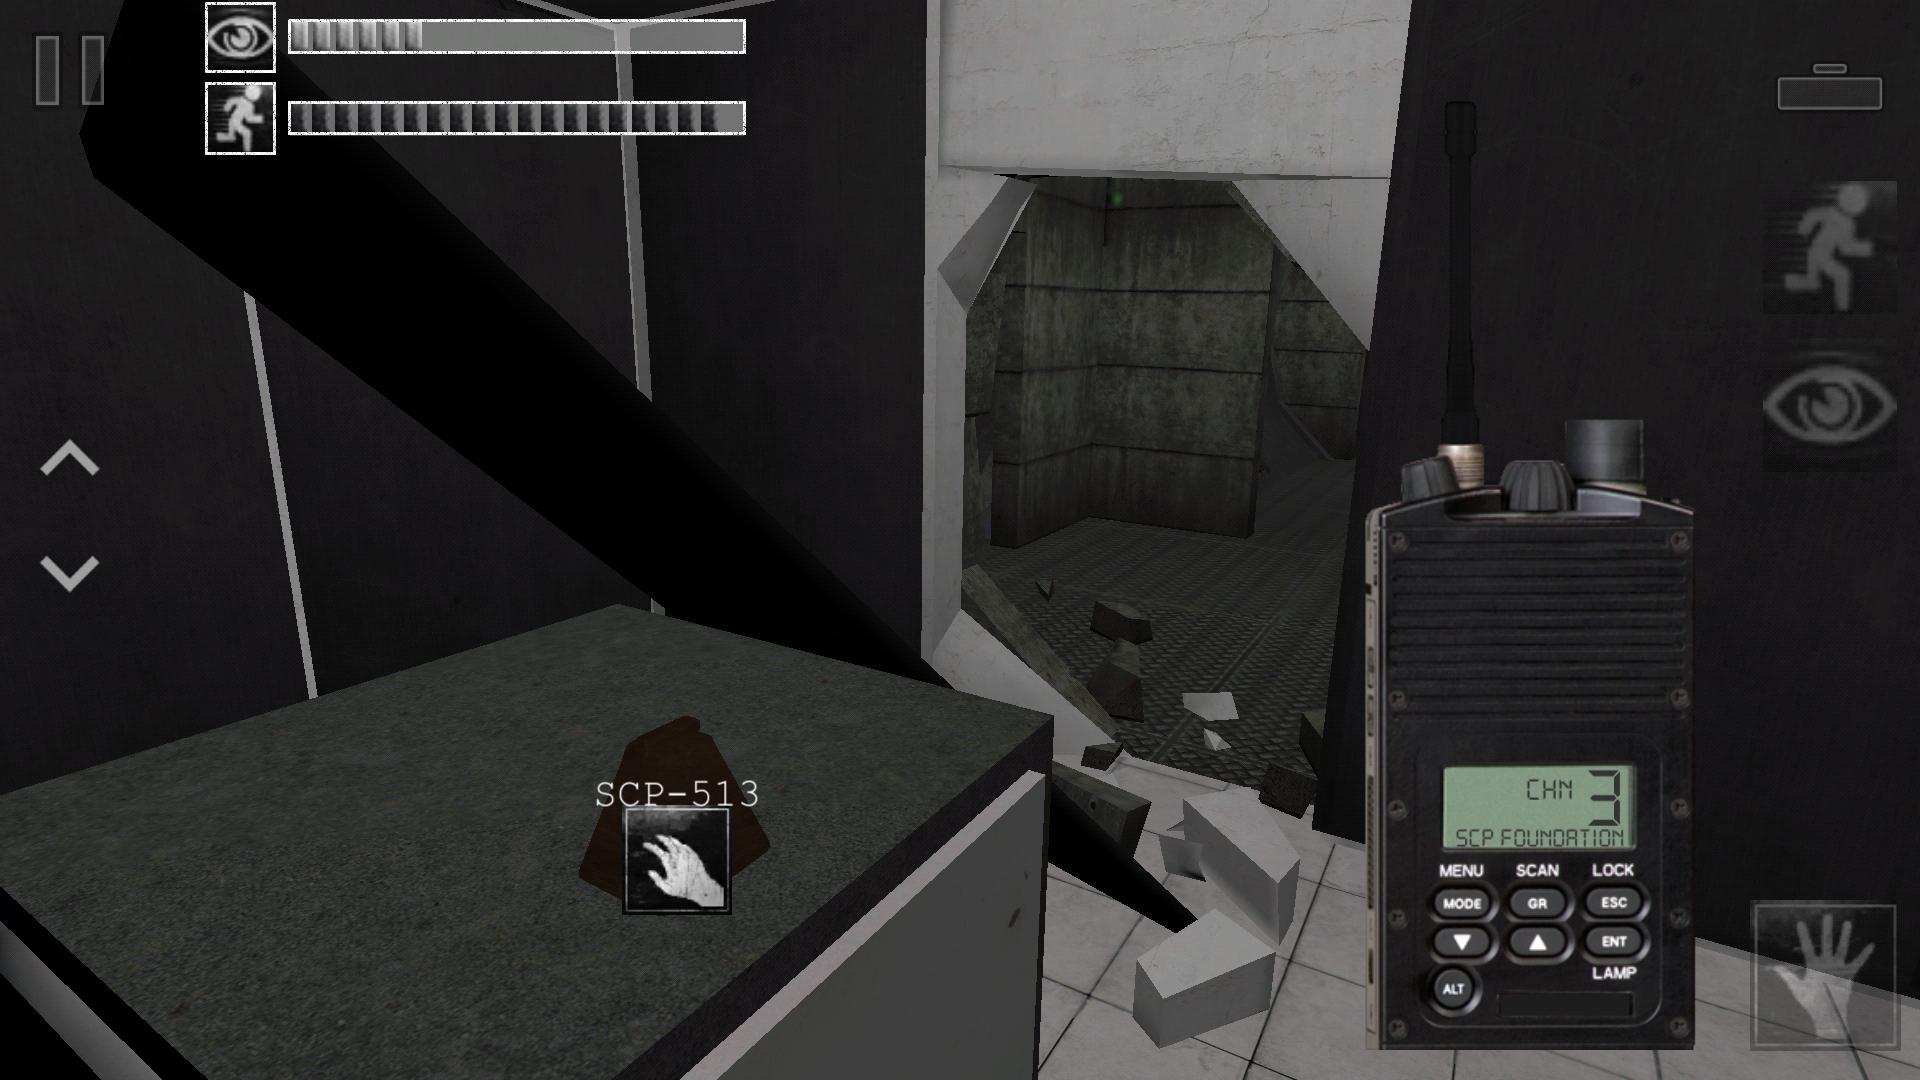 SCP - Containment Breach Mobile 1.0.1 Screenshot 3